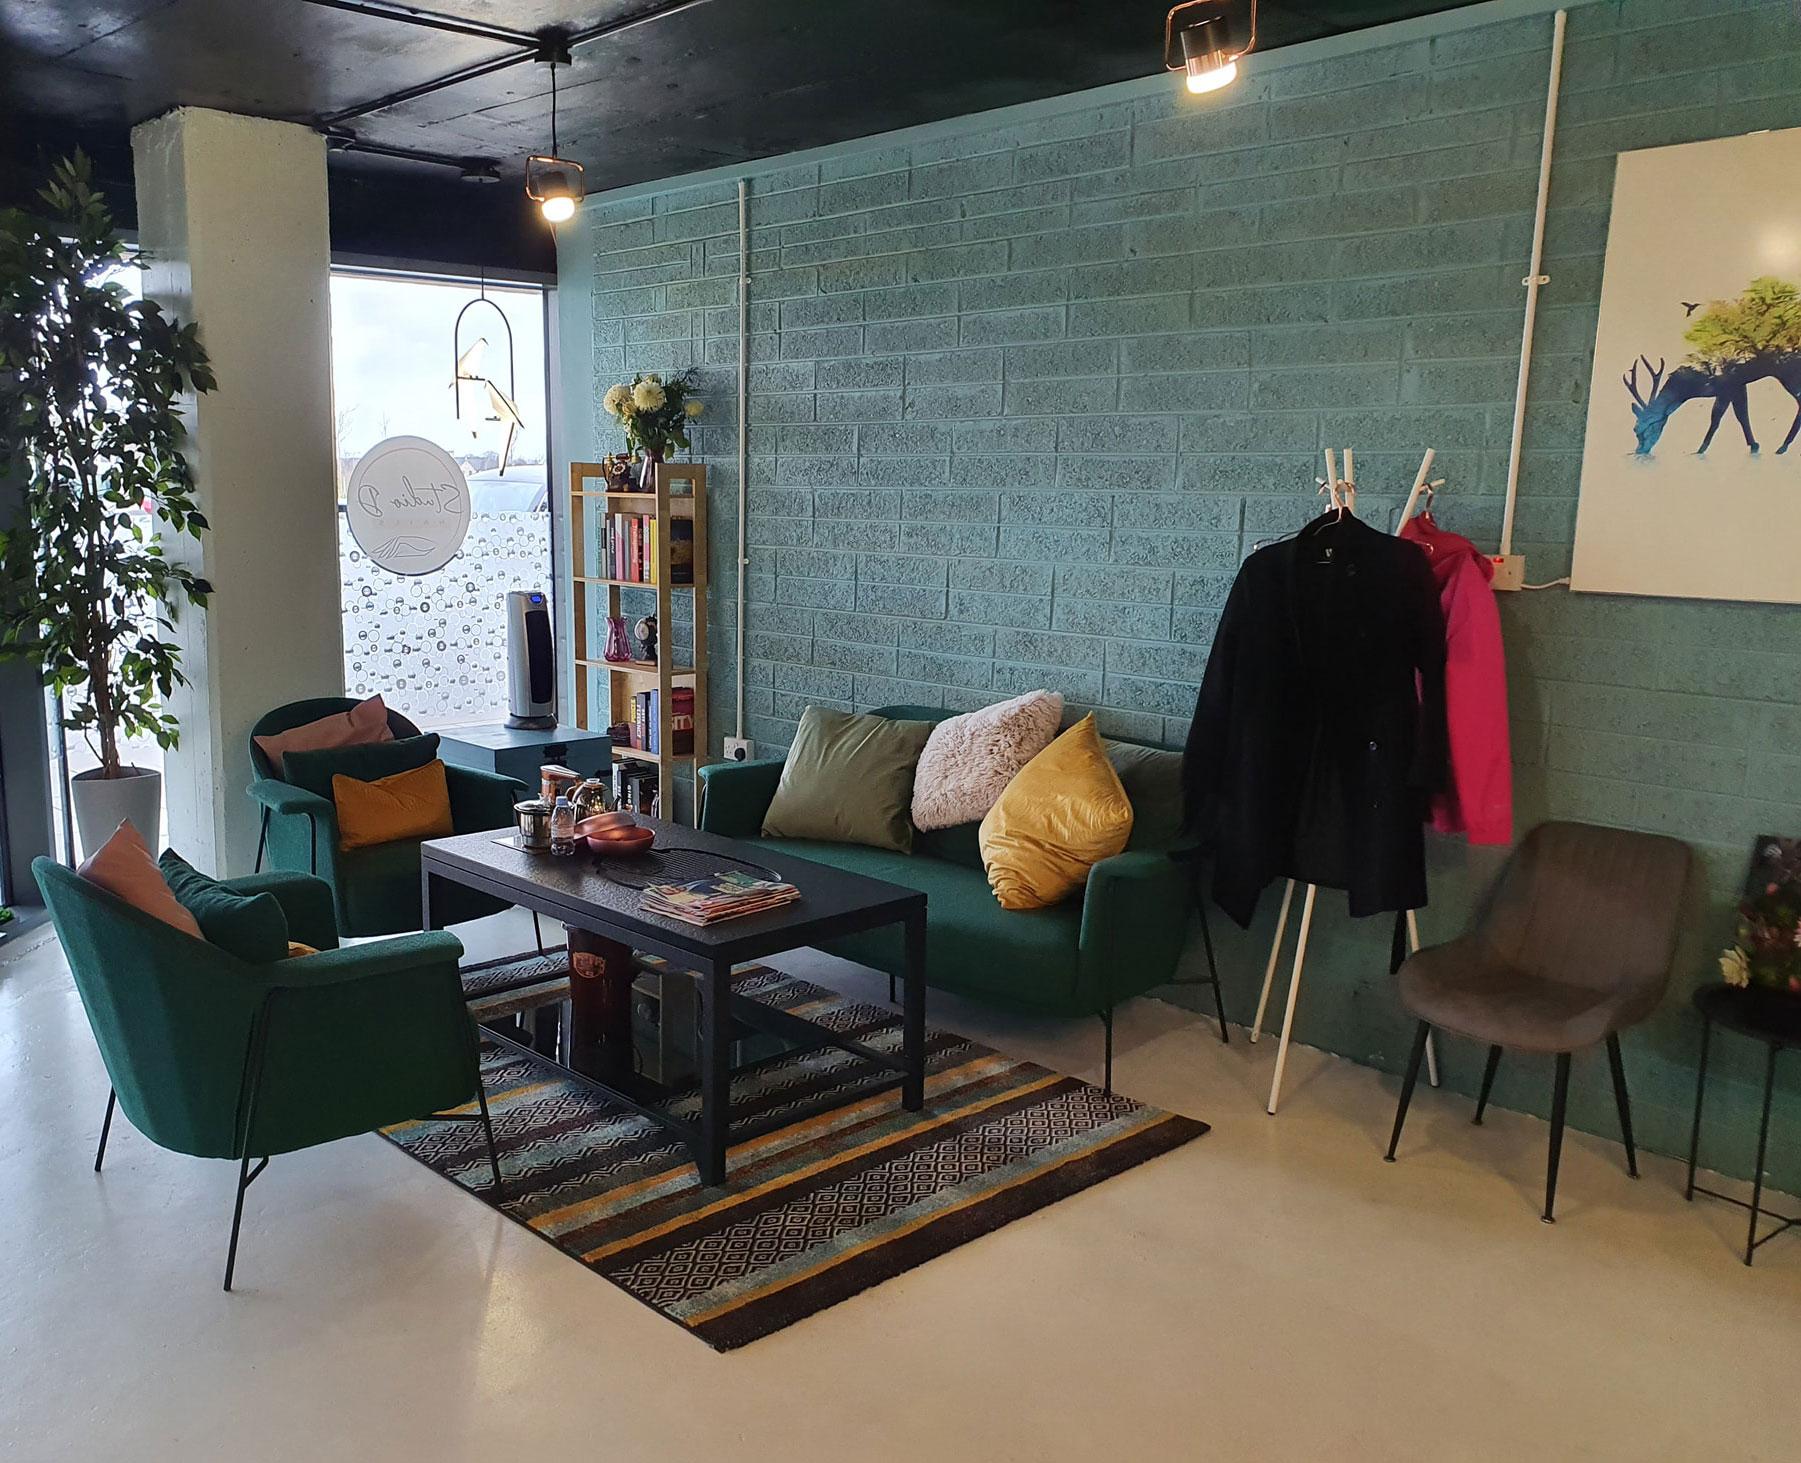 Studio D Nail & Beauty Salon